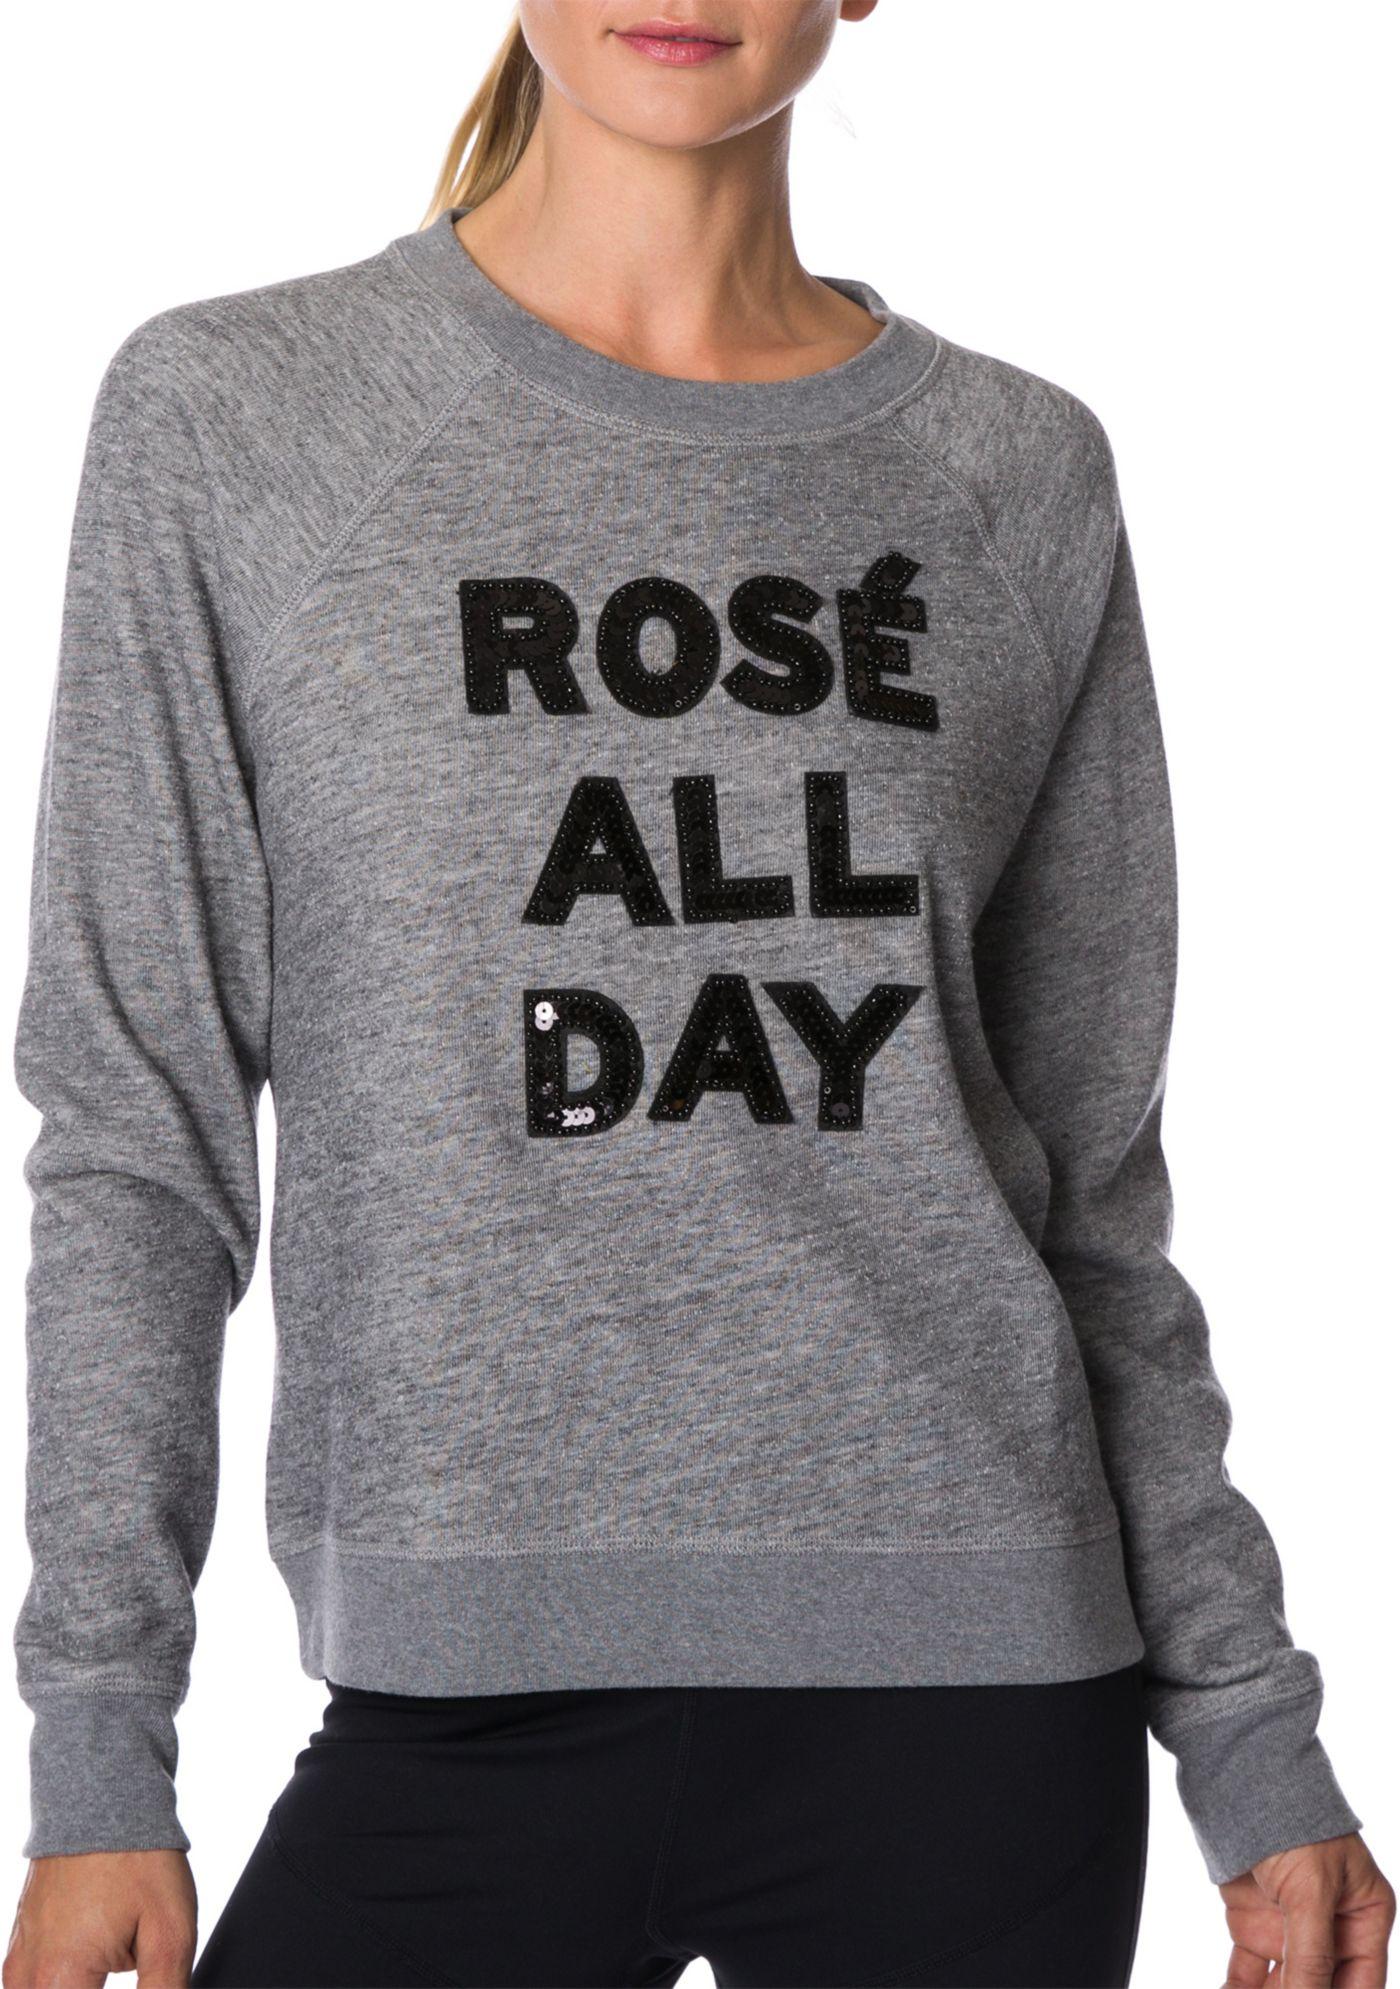 Betsey Johnson Performance Women's Rosé All Day Sequin Sweatshirt